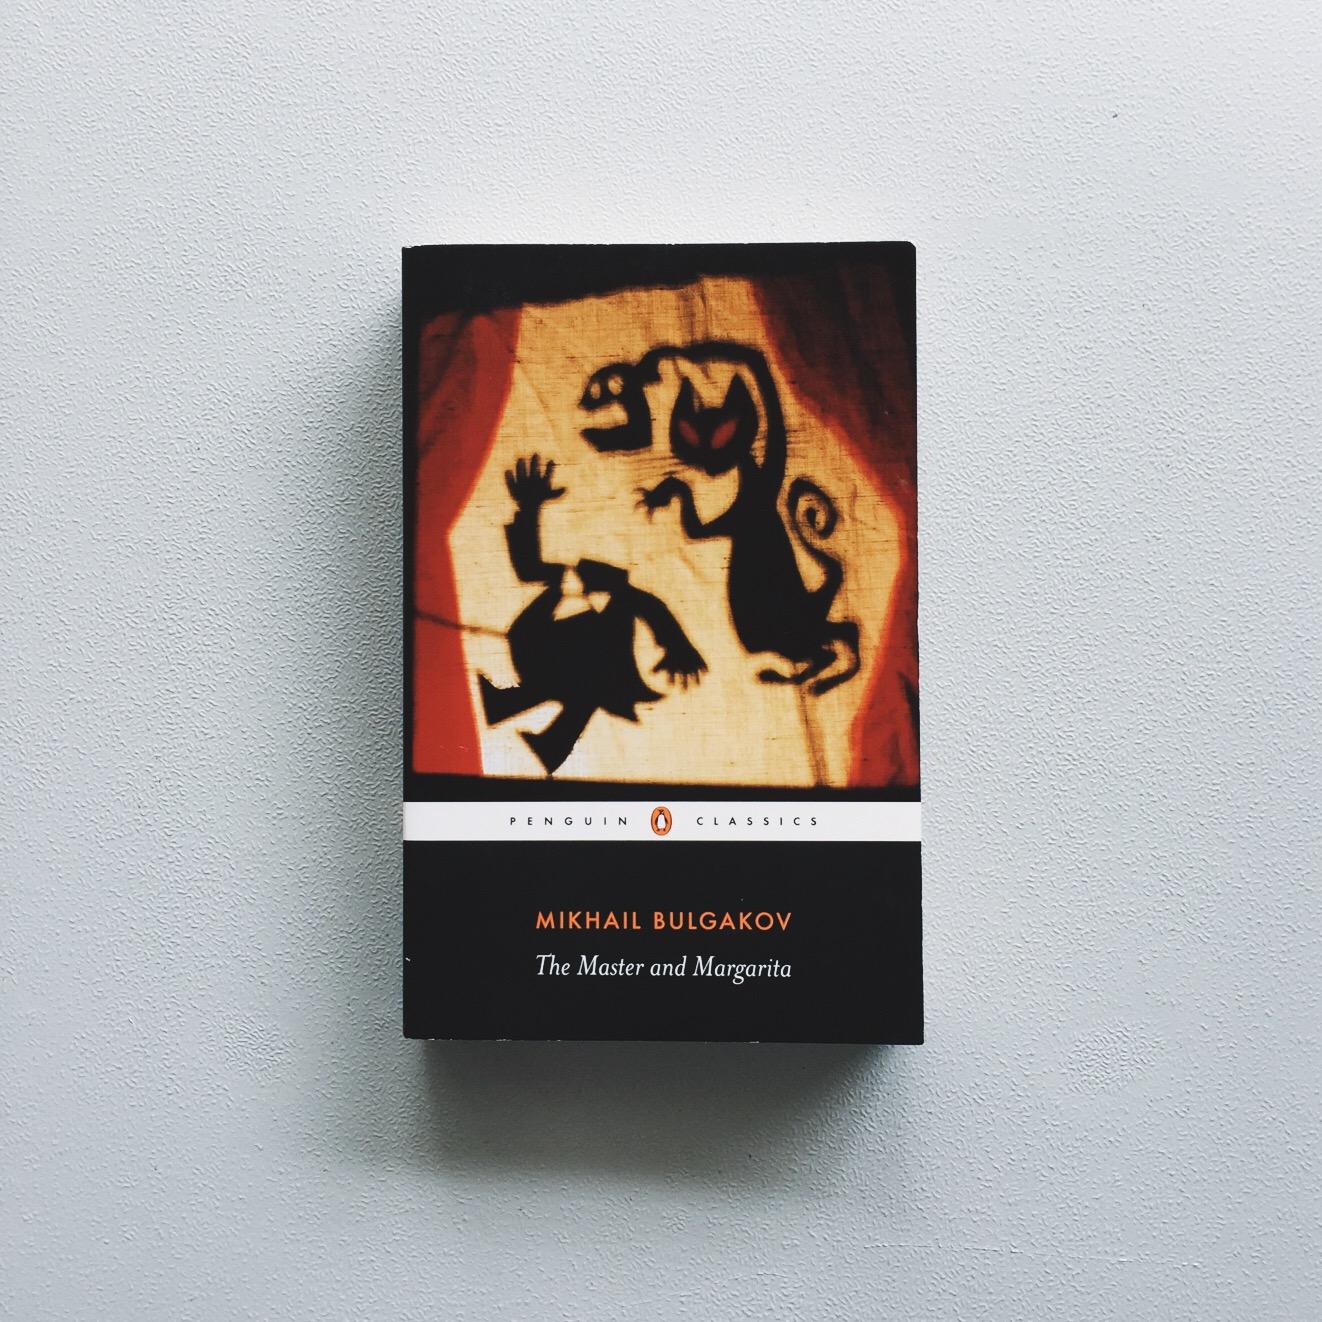 9/ The Master and Margarita — Mikhail Bulgakov